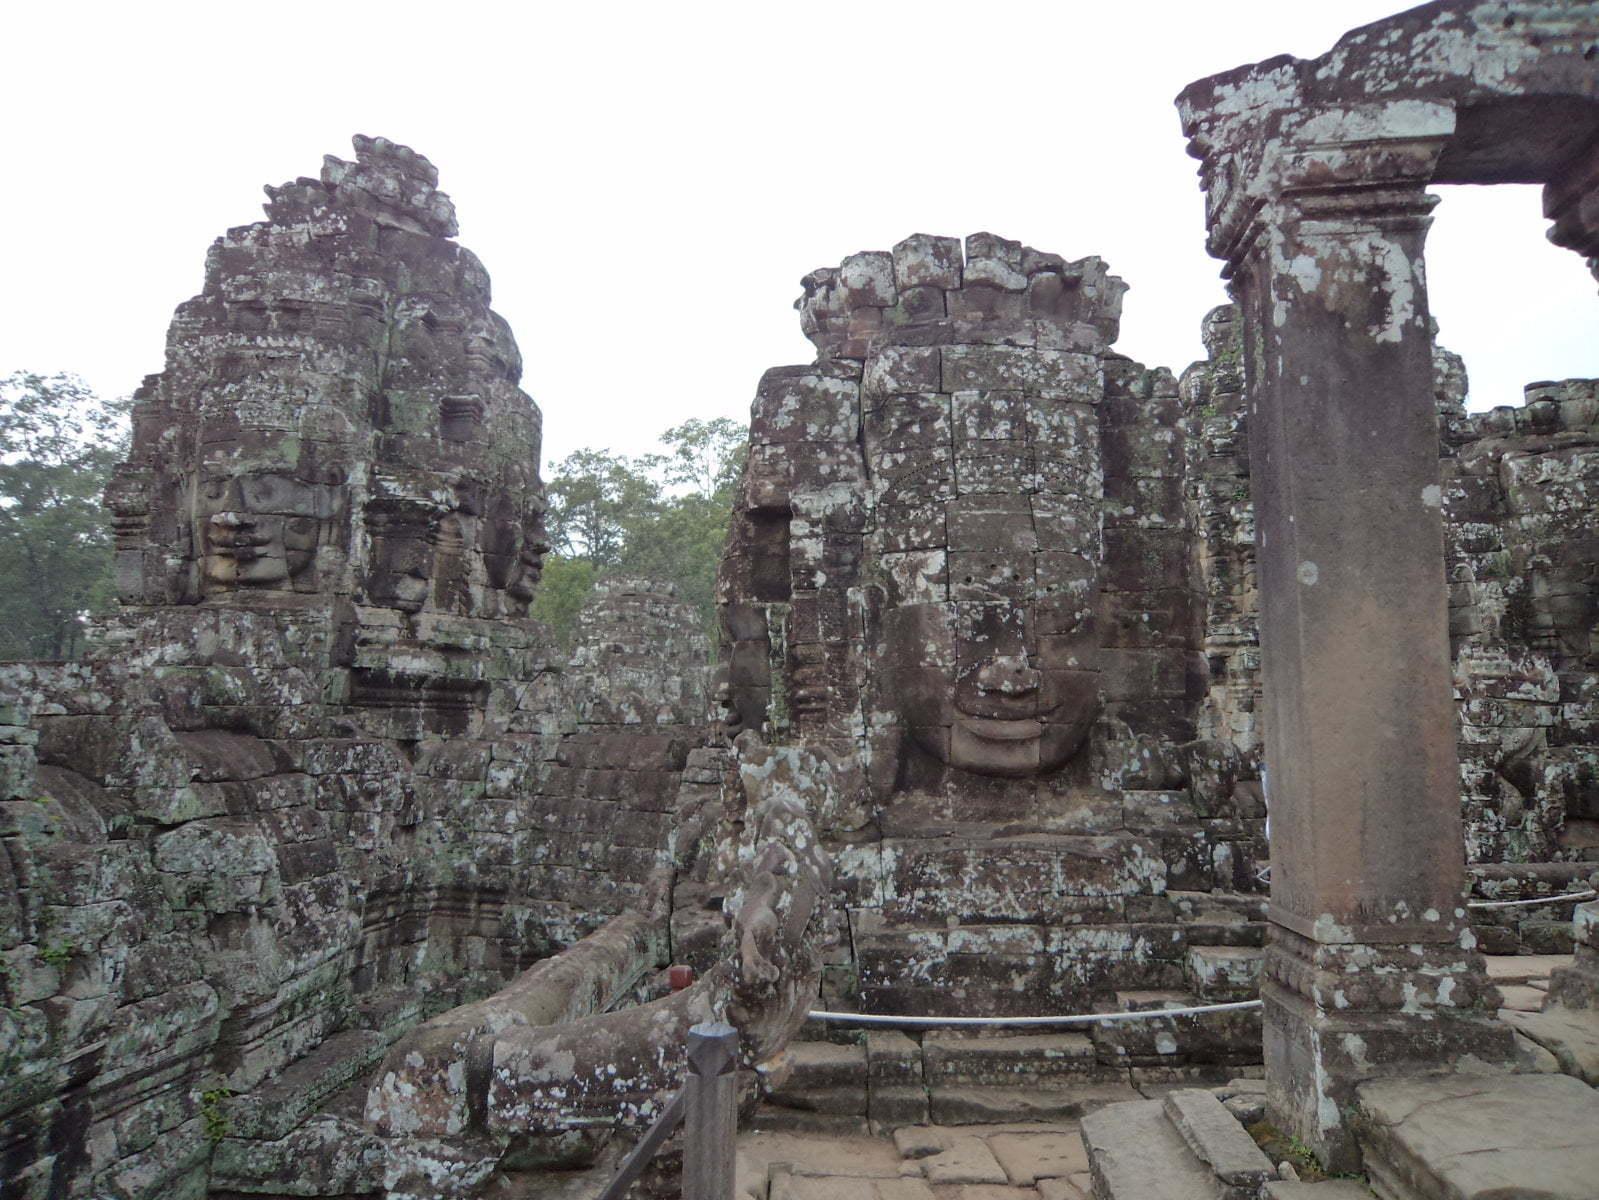 Templo Bayon (2) no circuito pequeno em Siem Reap, Camboja